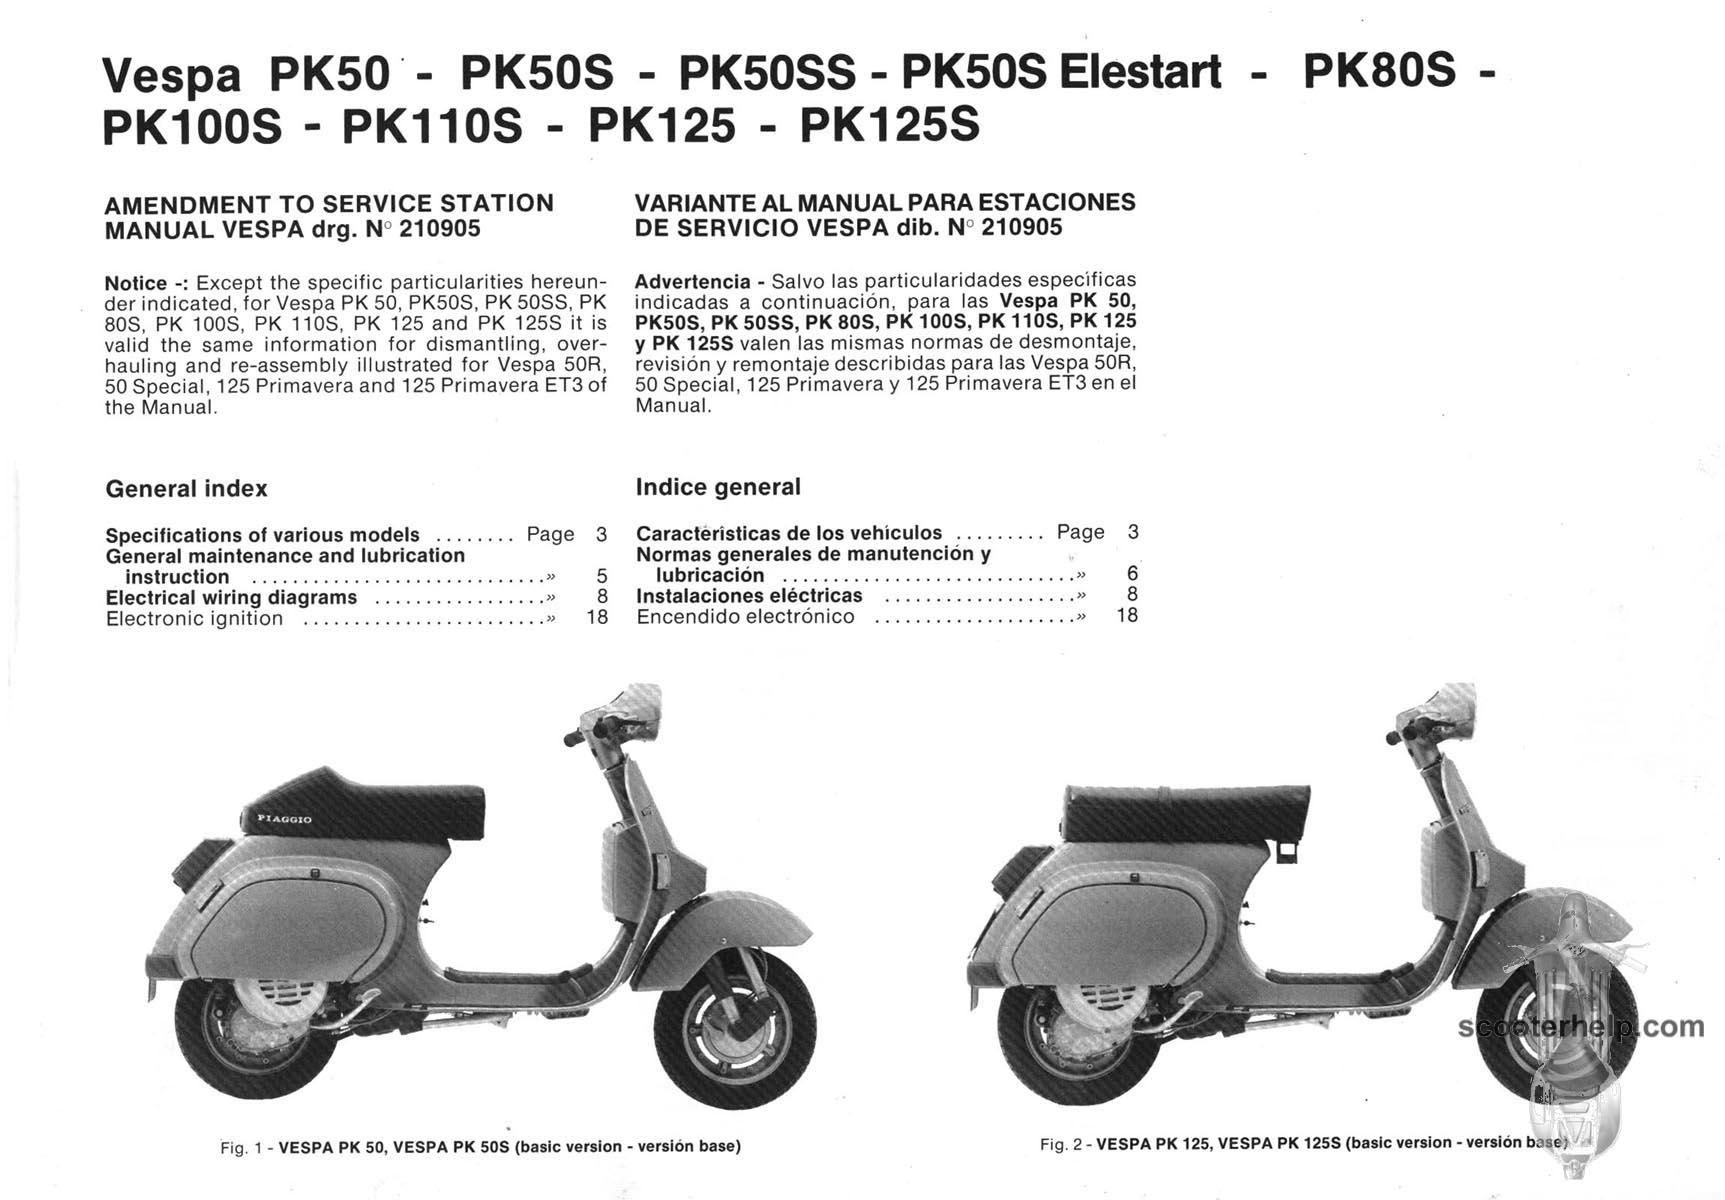 Pk Factory Repair Manual Vespa Lxv Fuse Box Location Pk50 Pk50s Pk50ss Pk80s Pl100s Pk110s Pk125 Pk125s Book